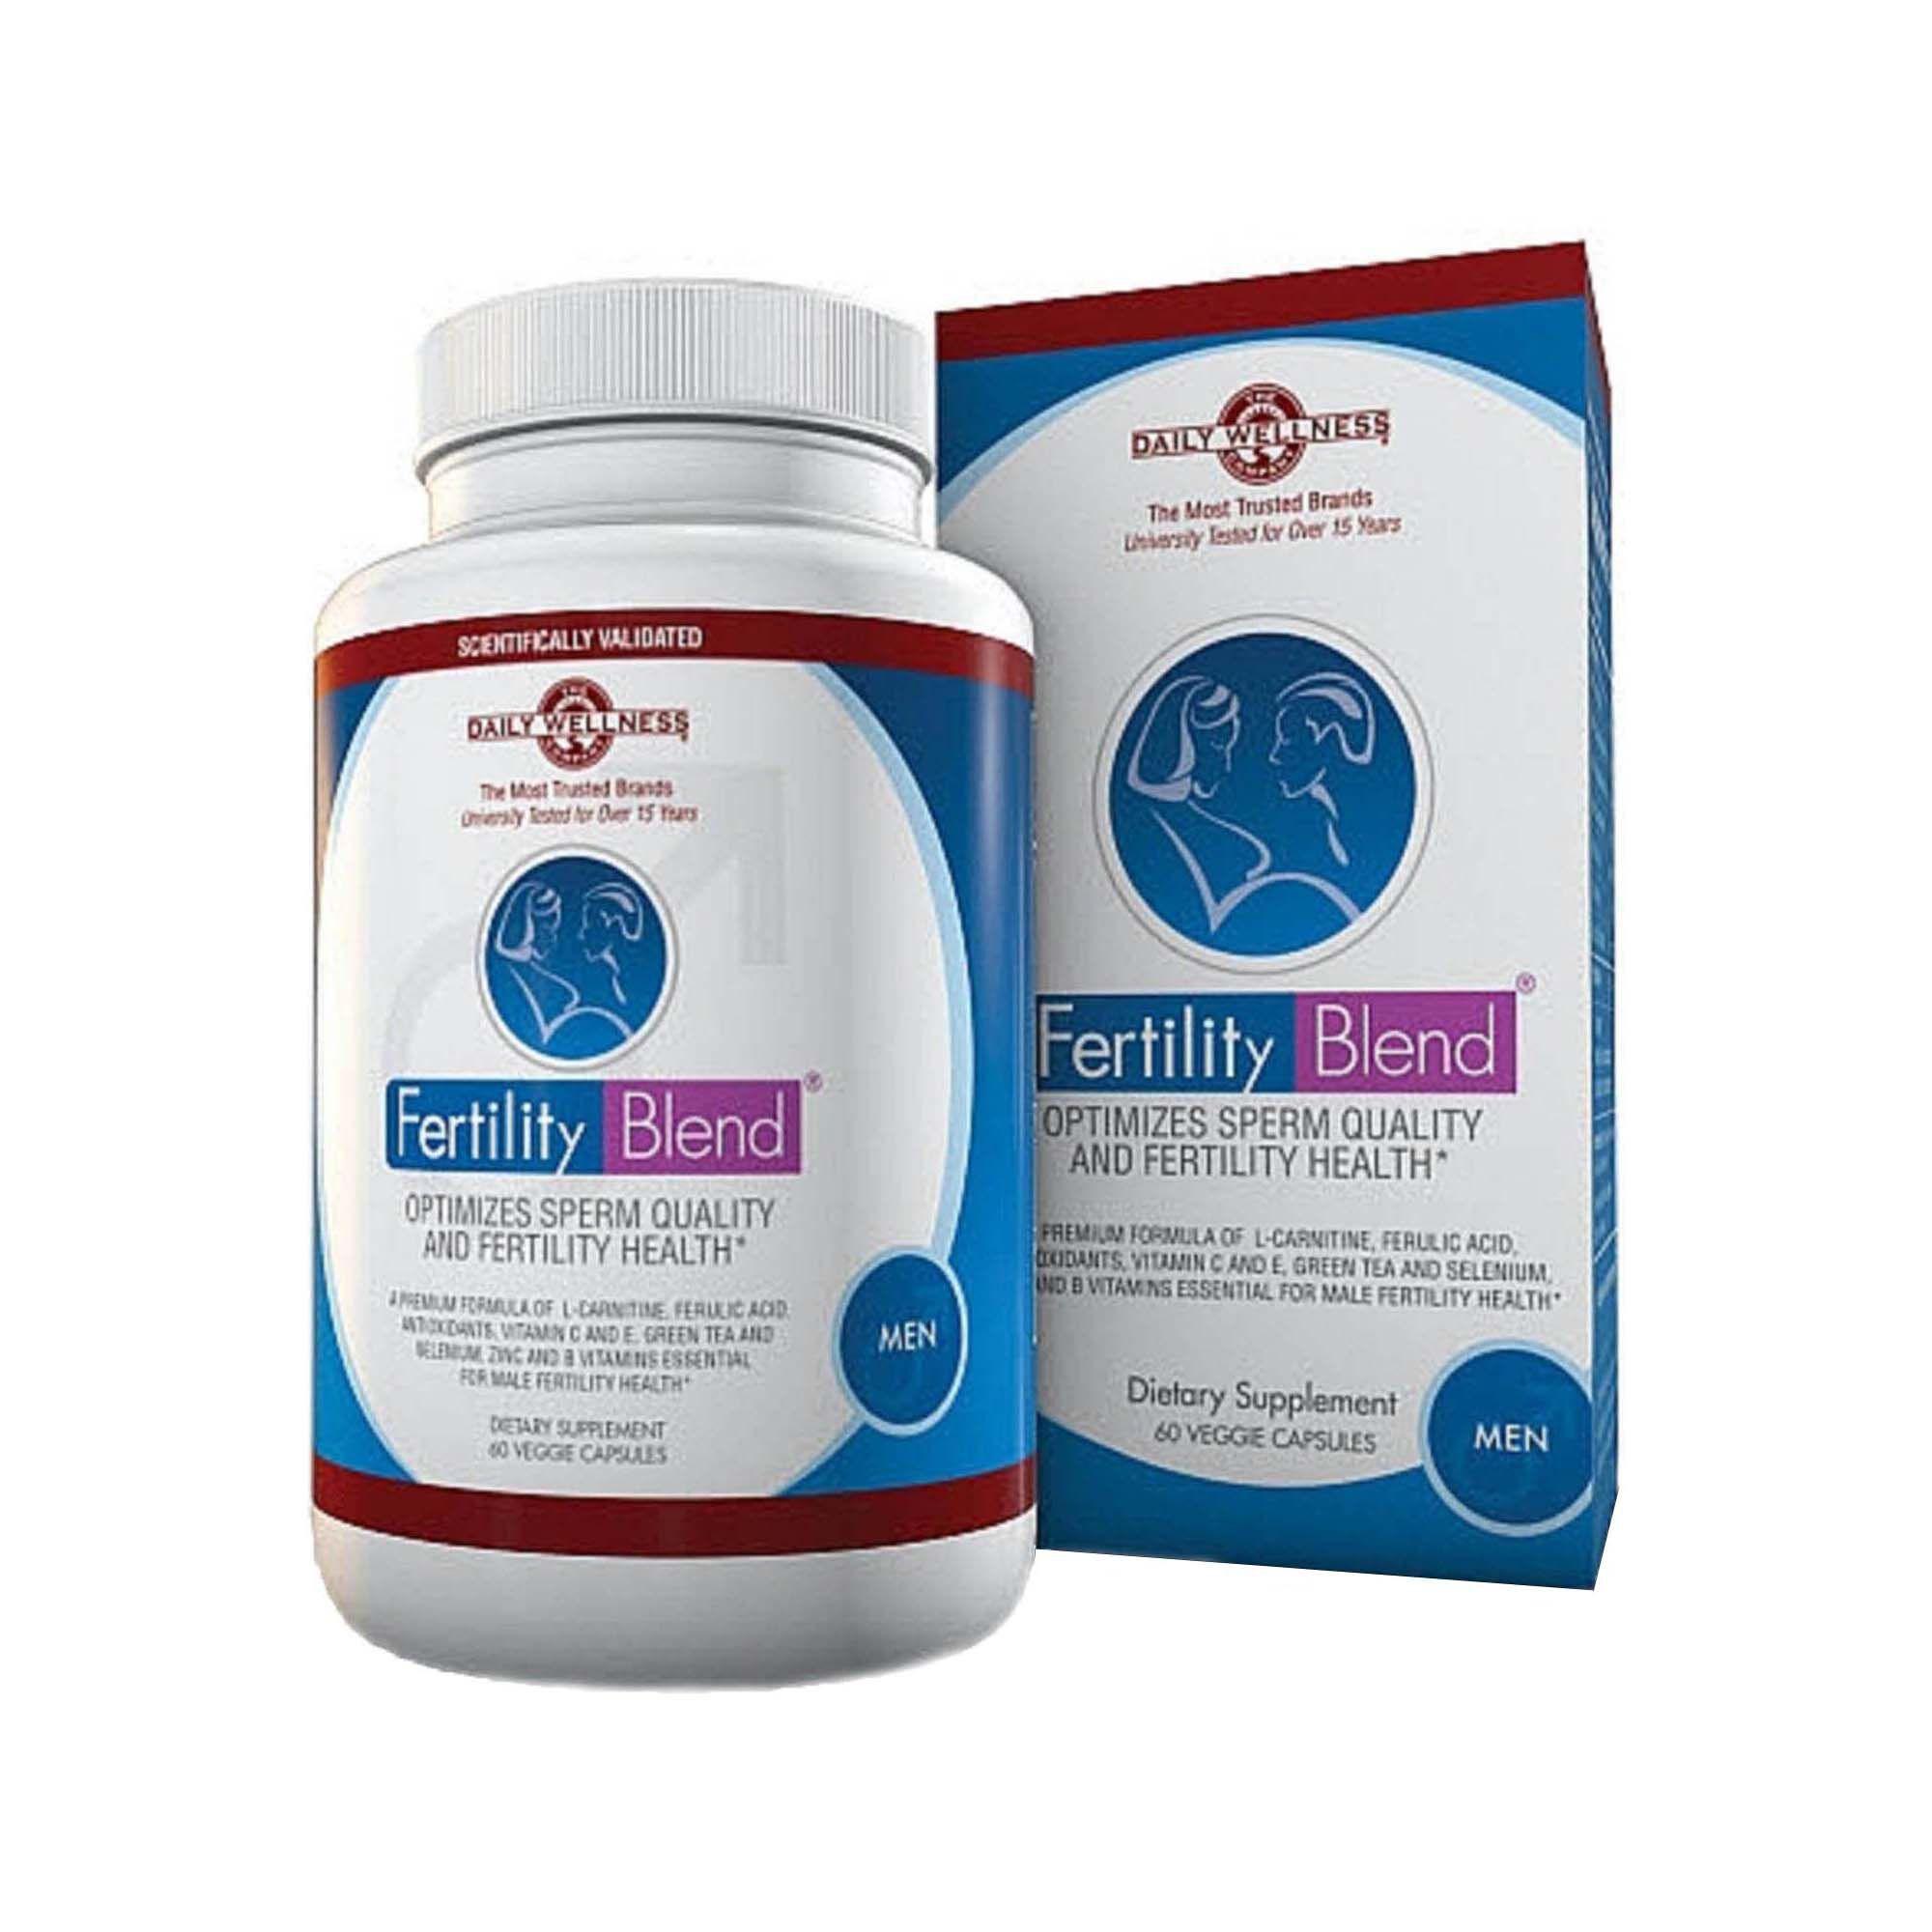 Daily Wellness Company® FertilityBlend® for Men | GNC